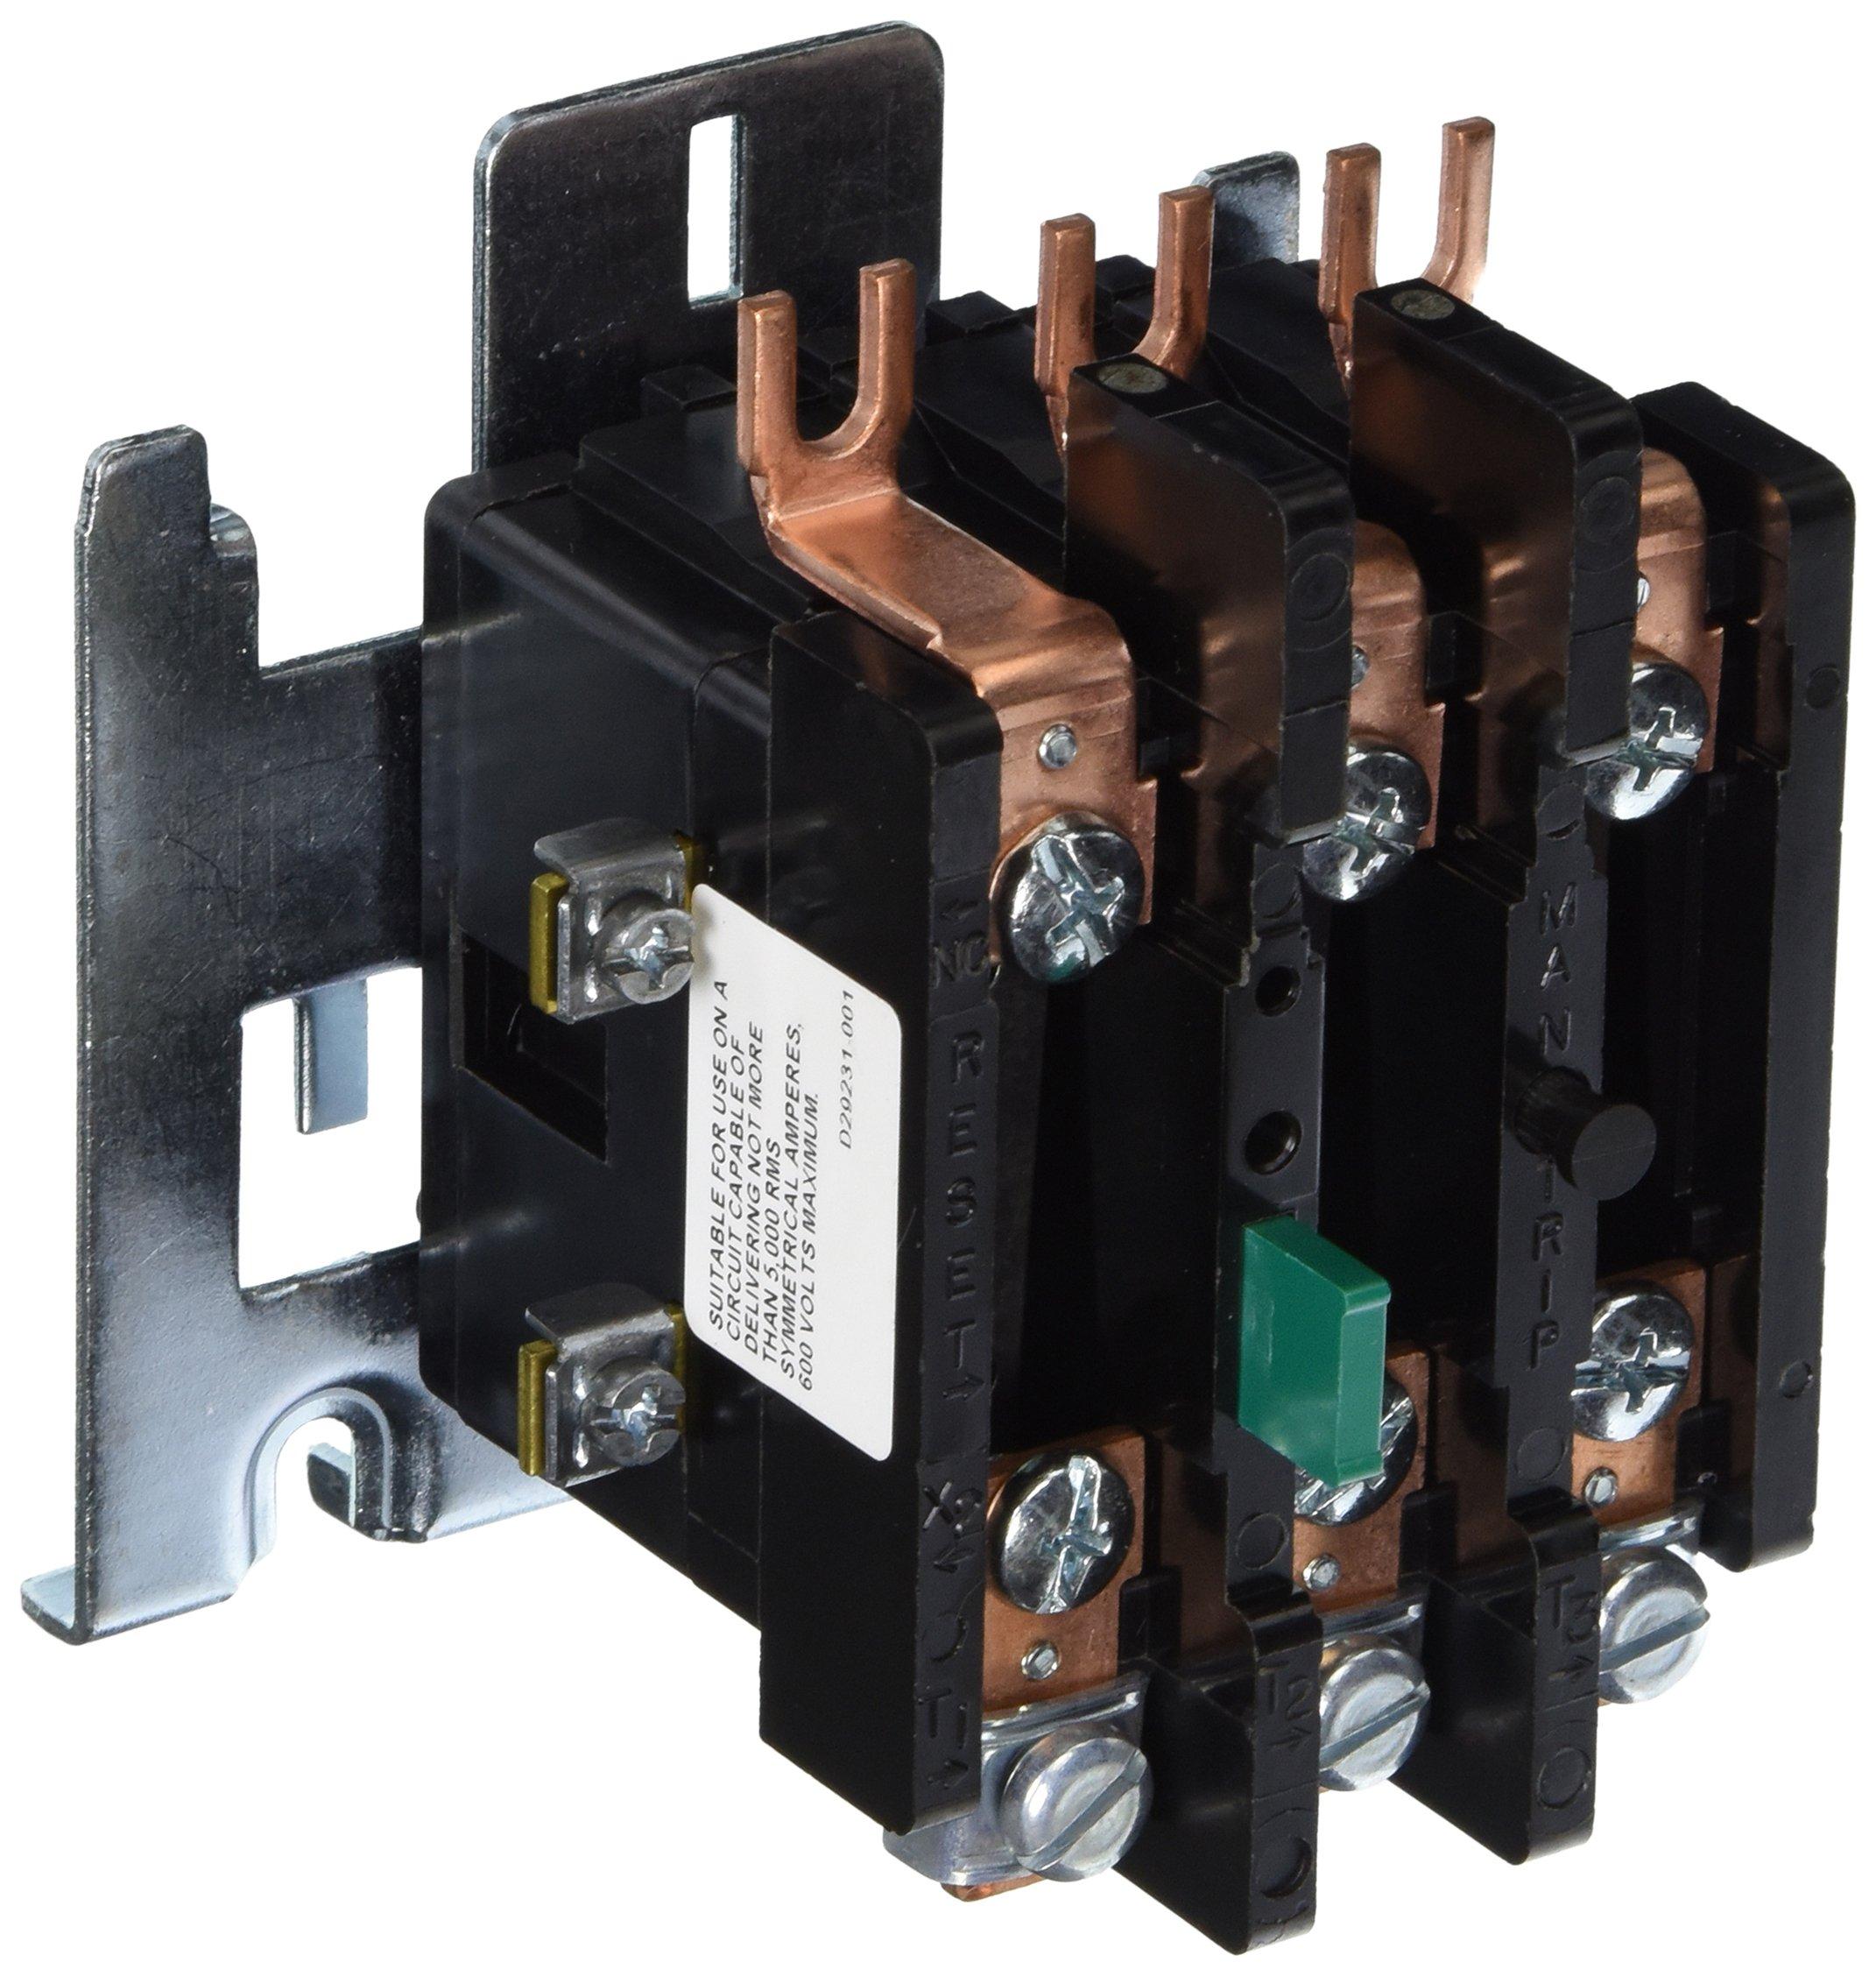 Siemens 48DC38AA3 Overload Relay, 1 NC Ambient Comp Bimetal, 00-1 Size, P Model, 3 Poles